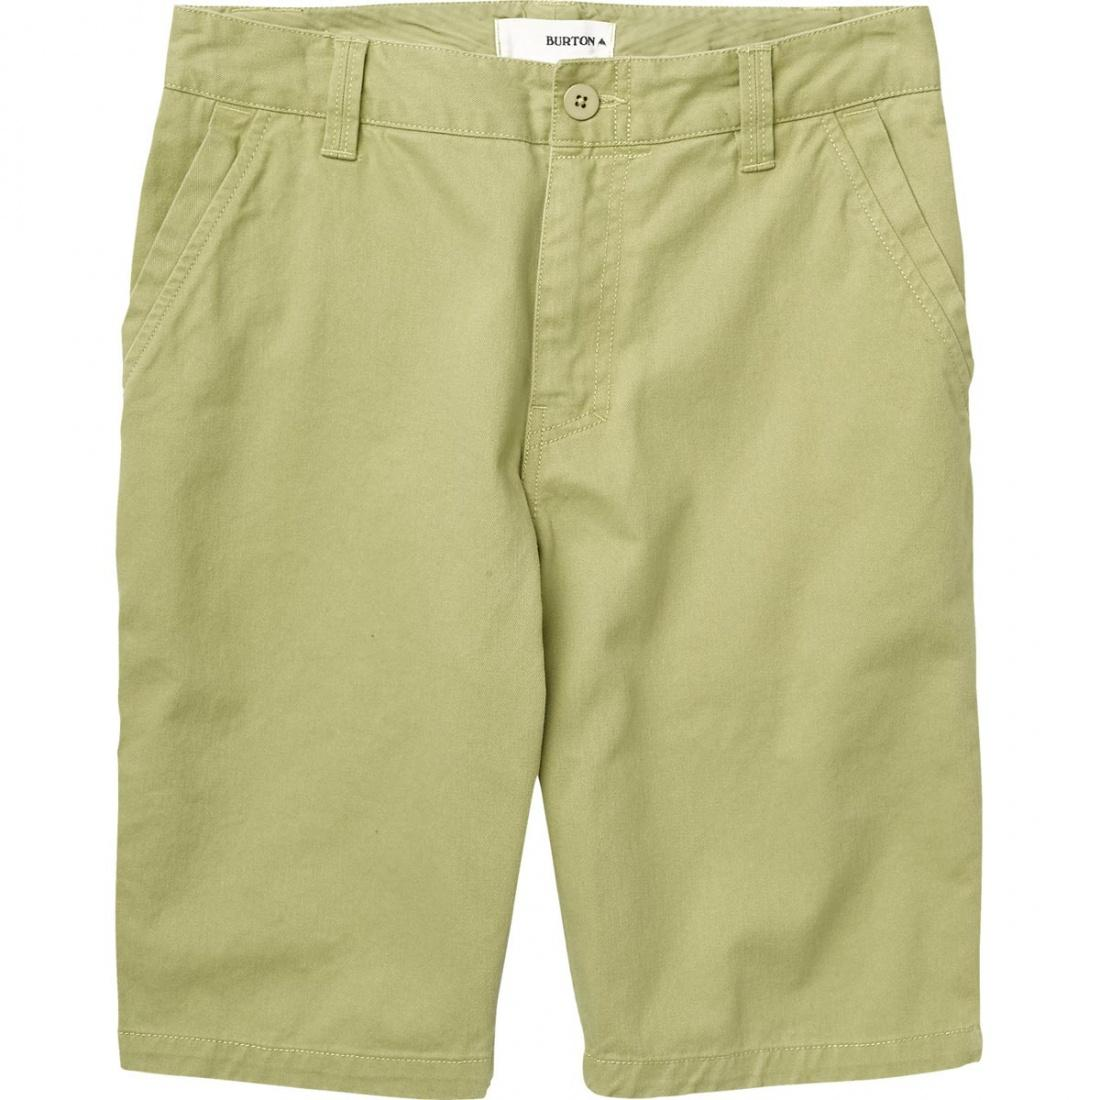 мужские шорты burton, бежевые